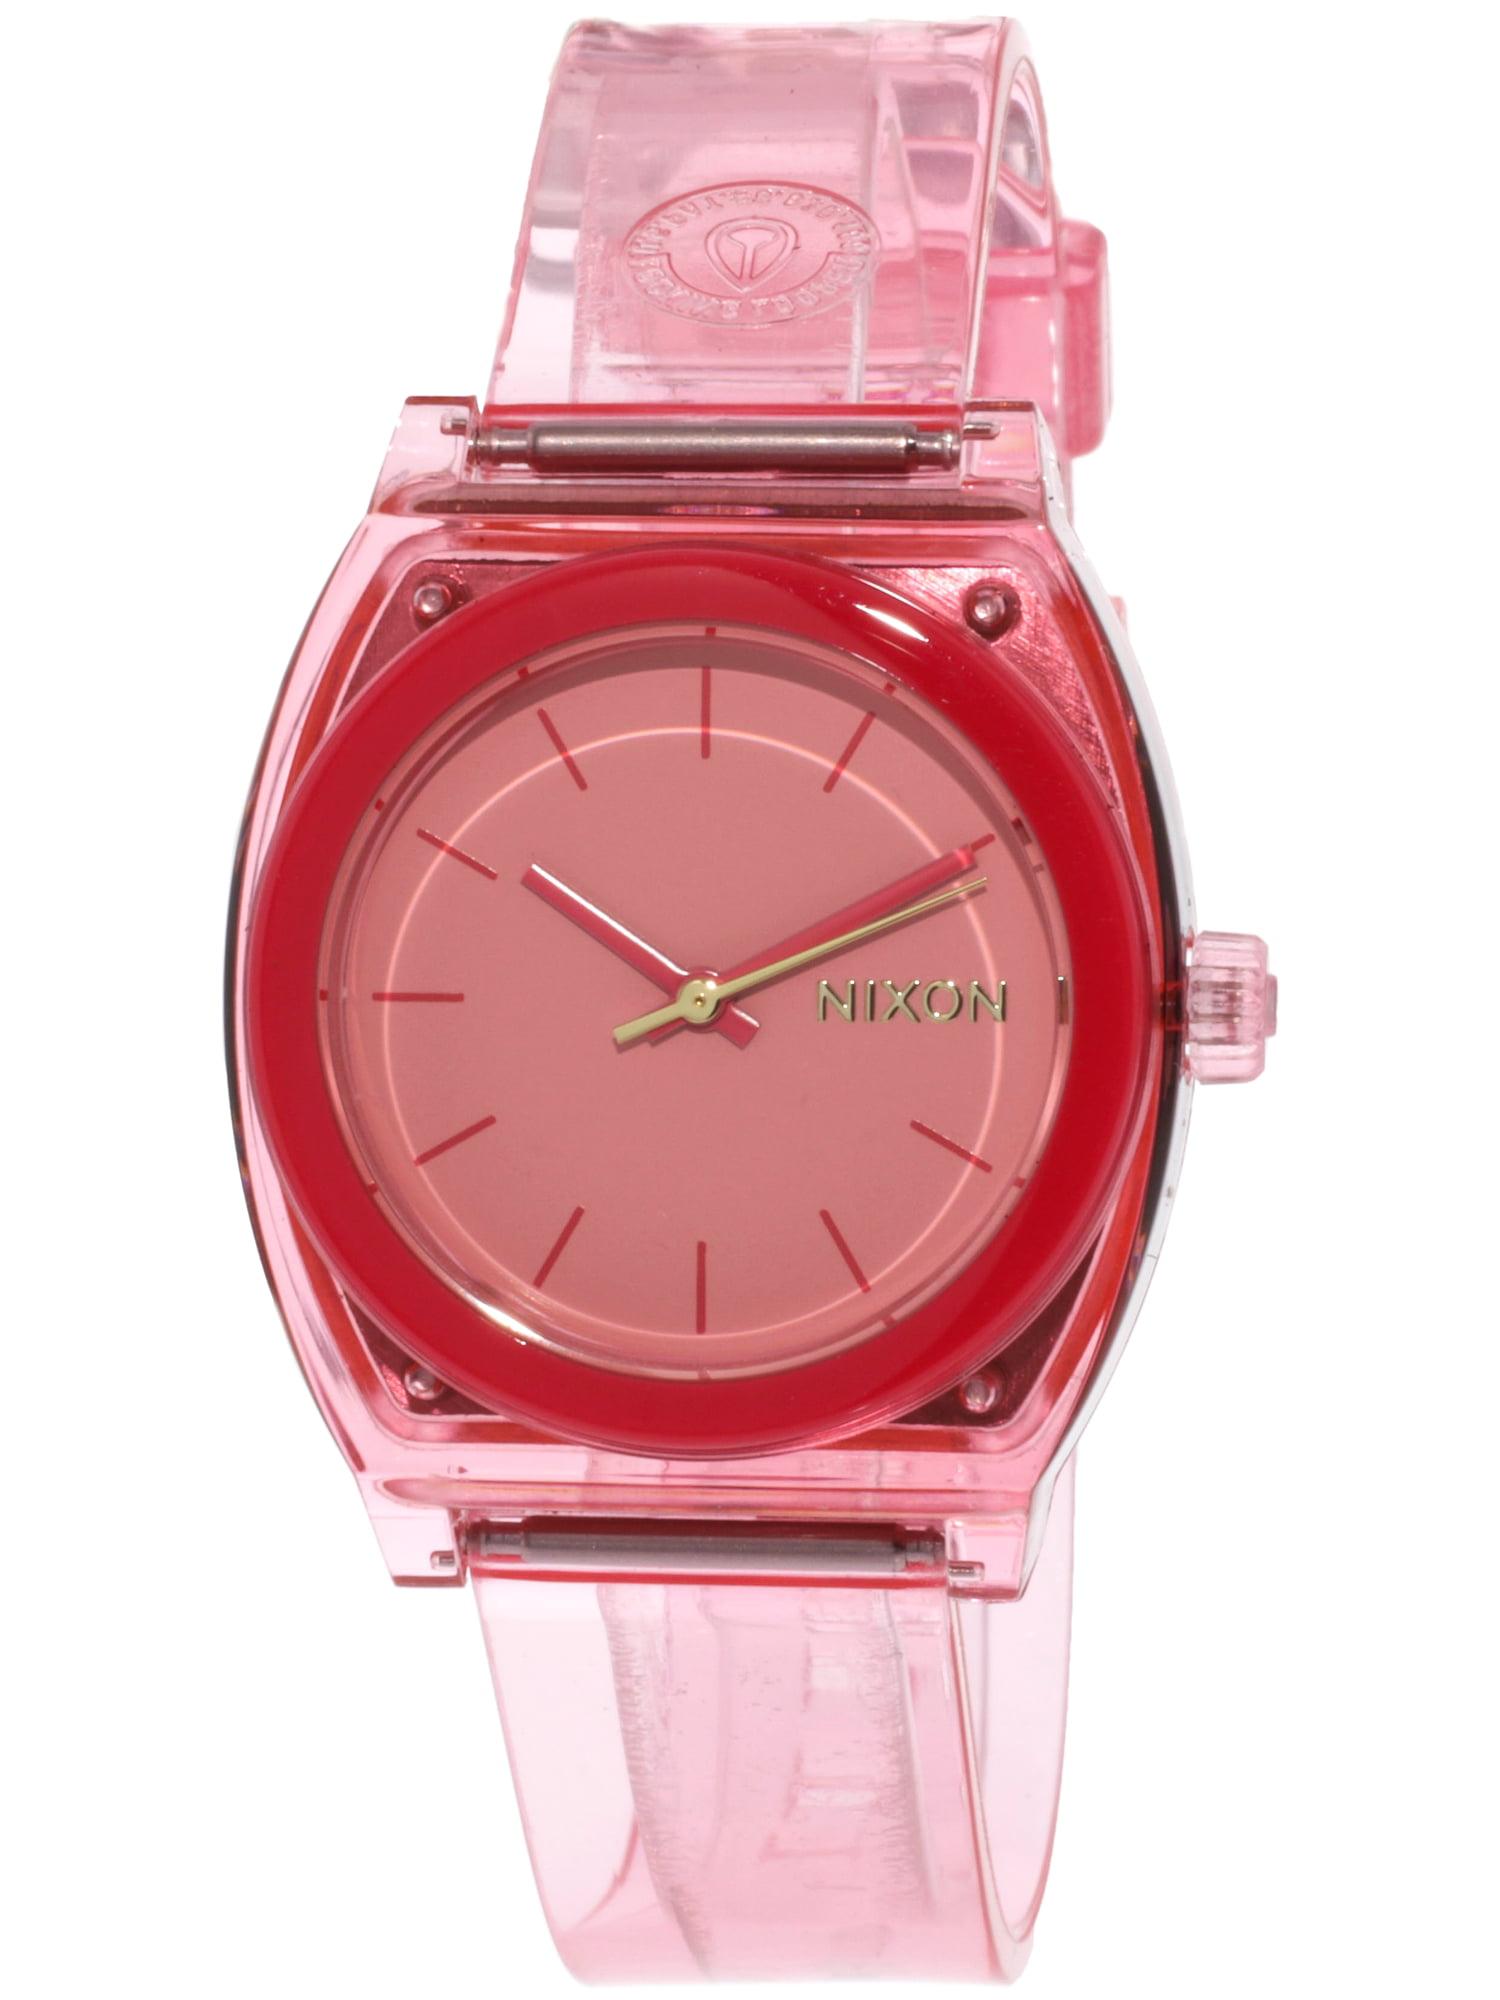 Nixon A1215685 Pink Resin Japanese Quartz Fashion Watch